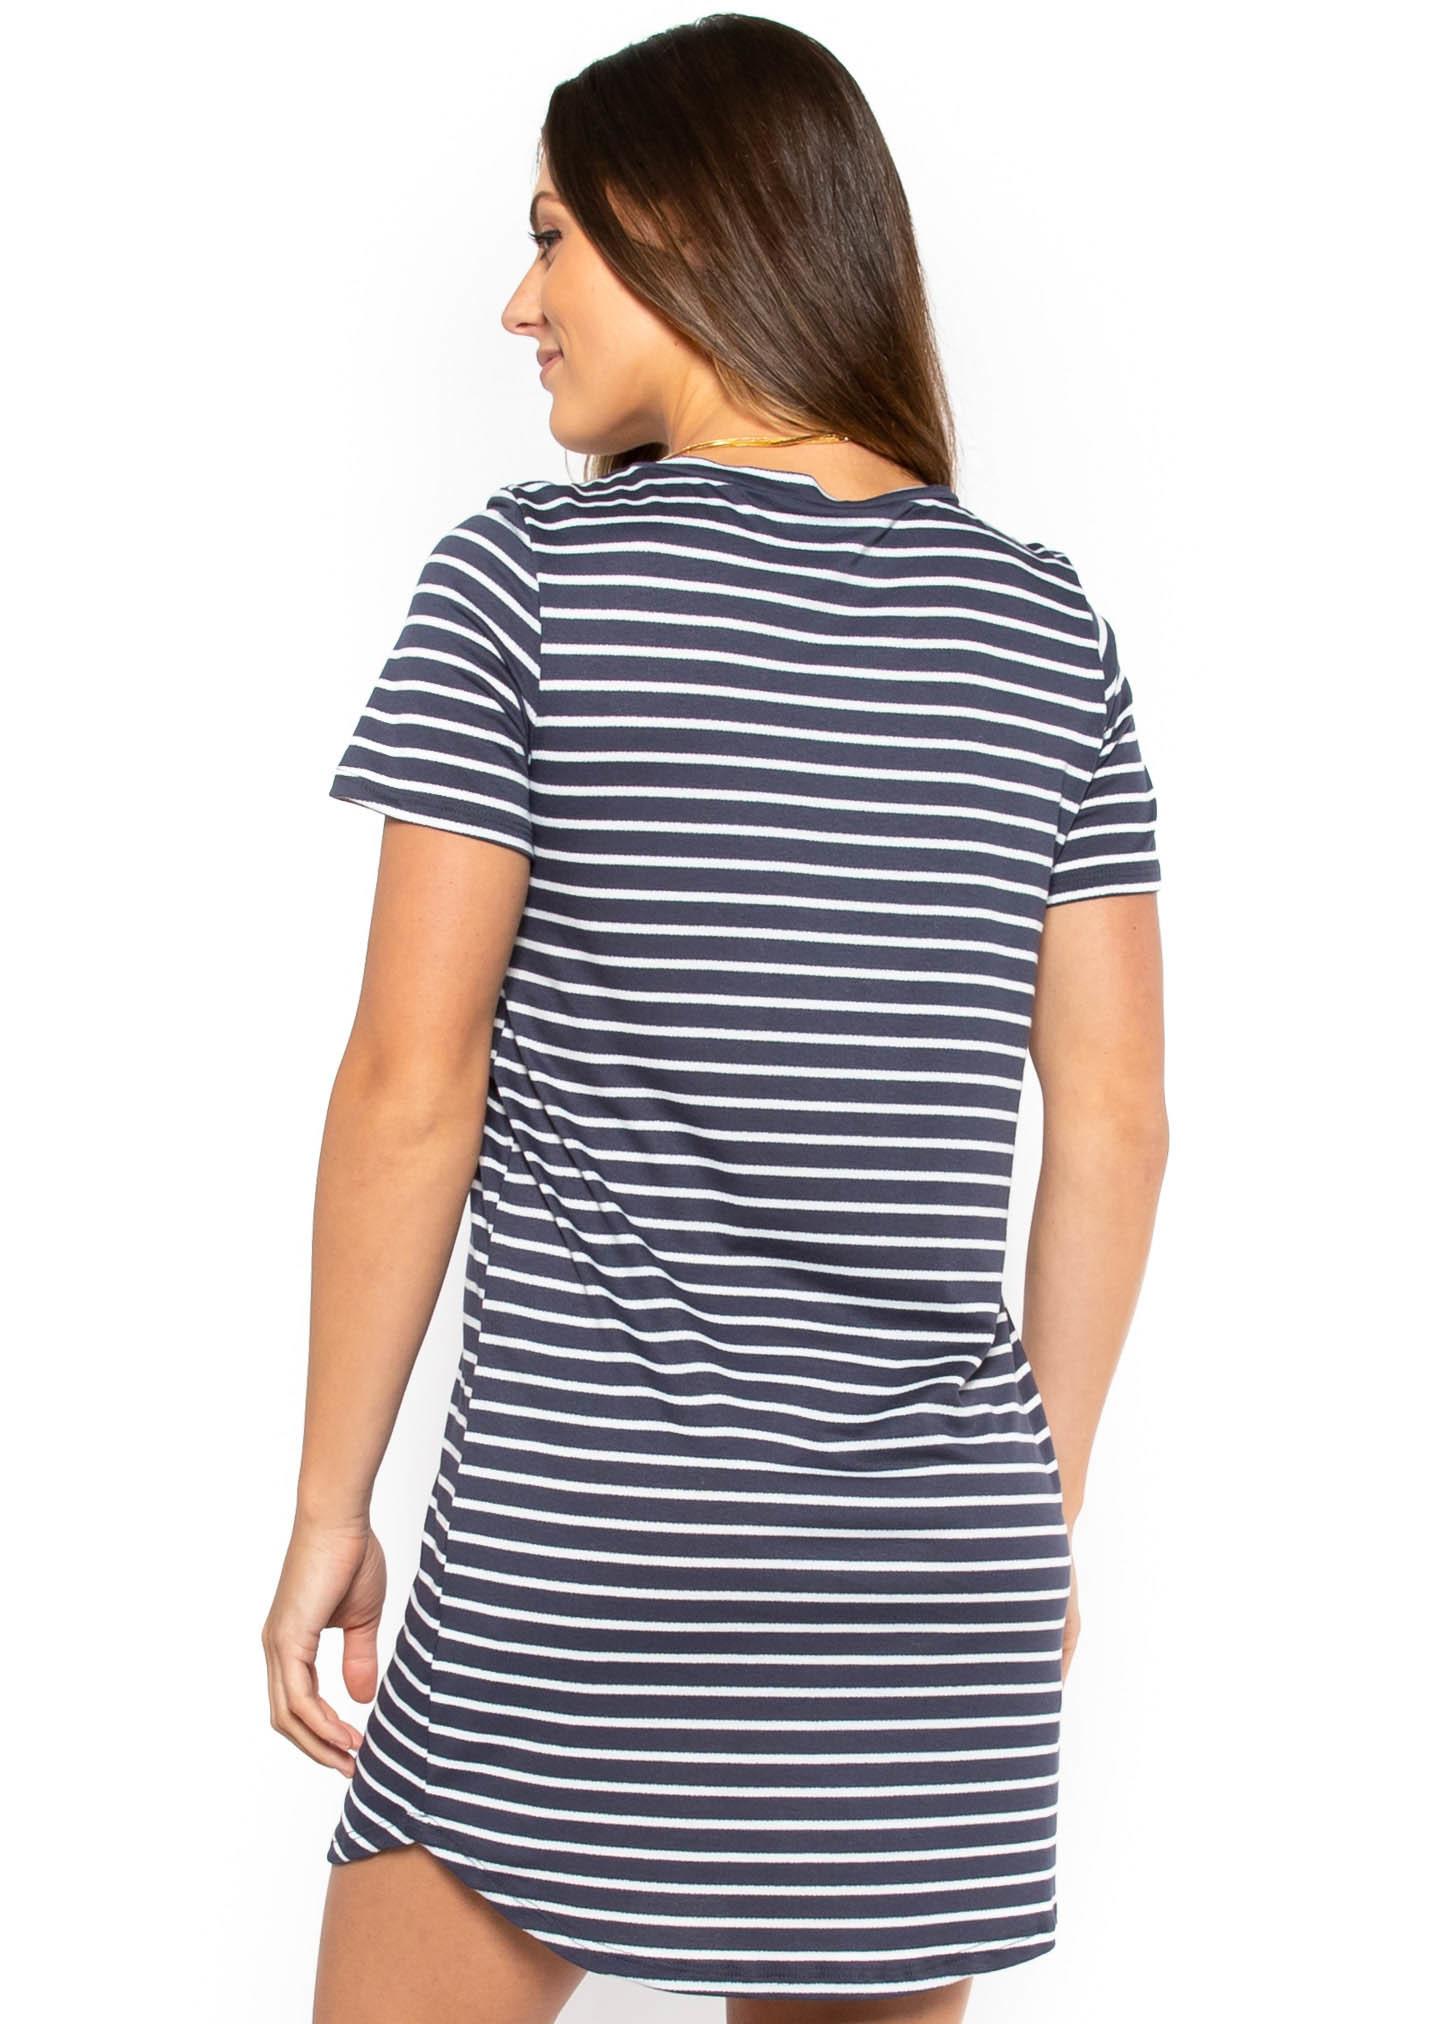 MEMPHIS T-SHIRT DRESS - GREY